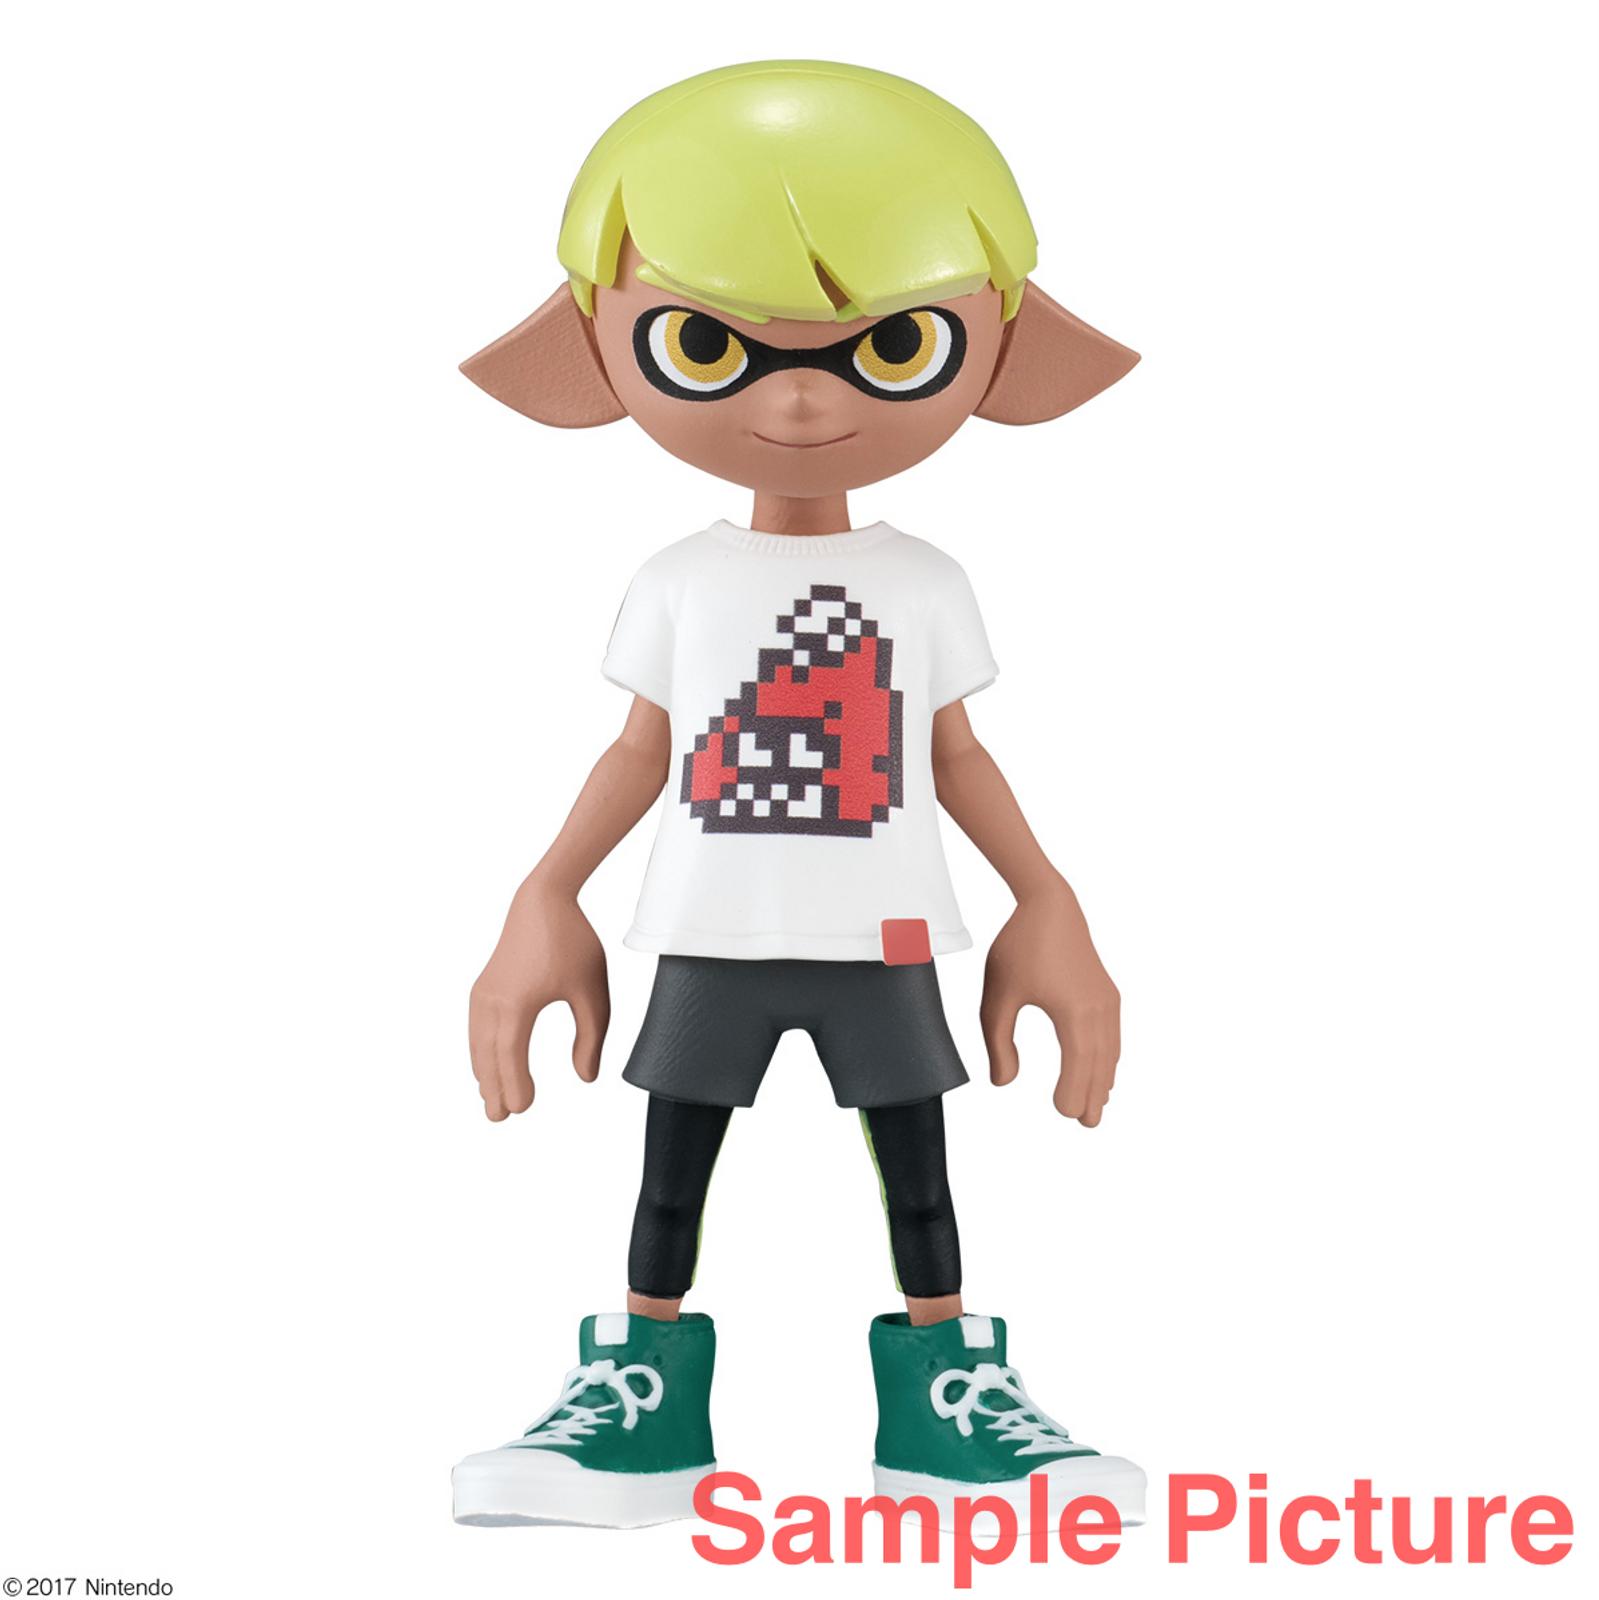 Splatoon 2 Dress-up Figure Gear Collection Squid BOY 3 JAPAN Nintendo Switch